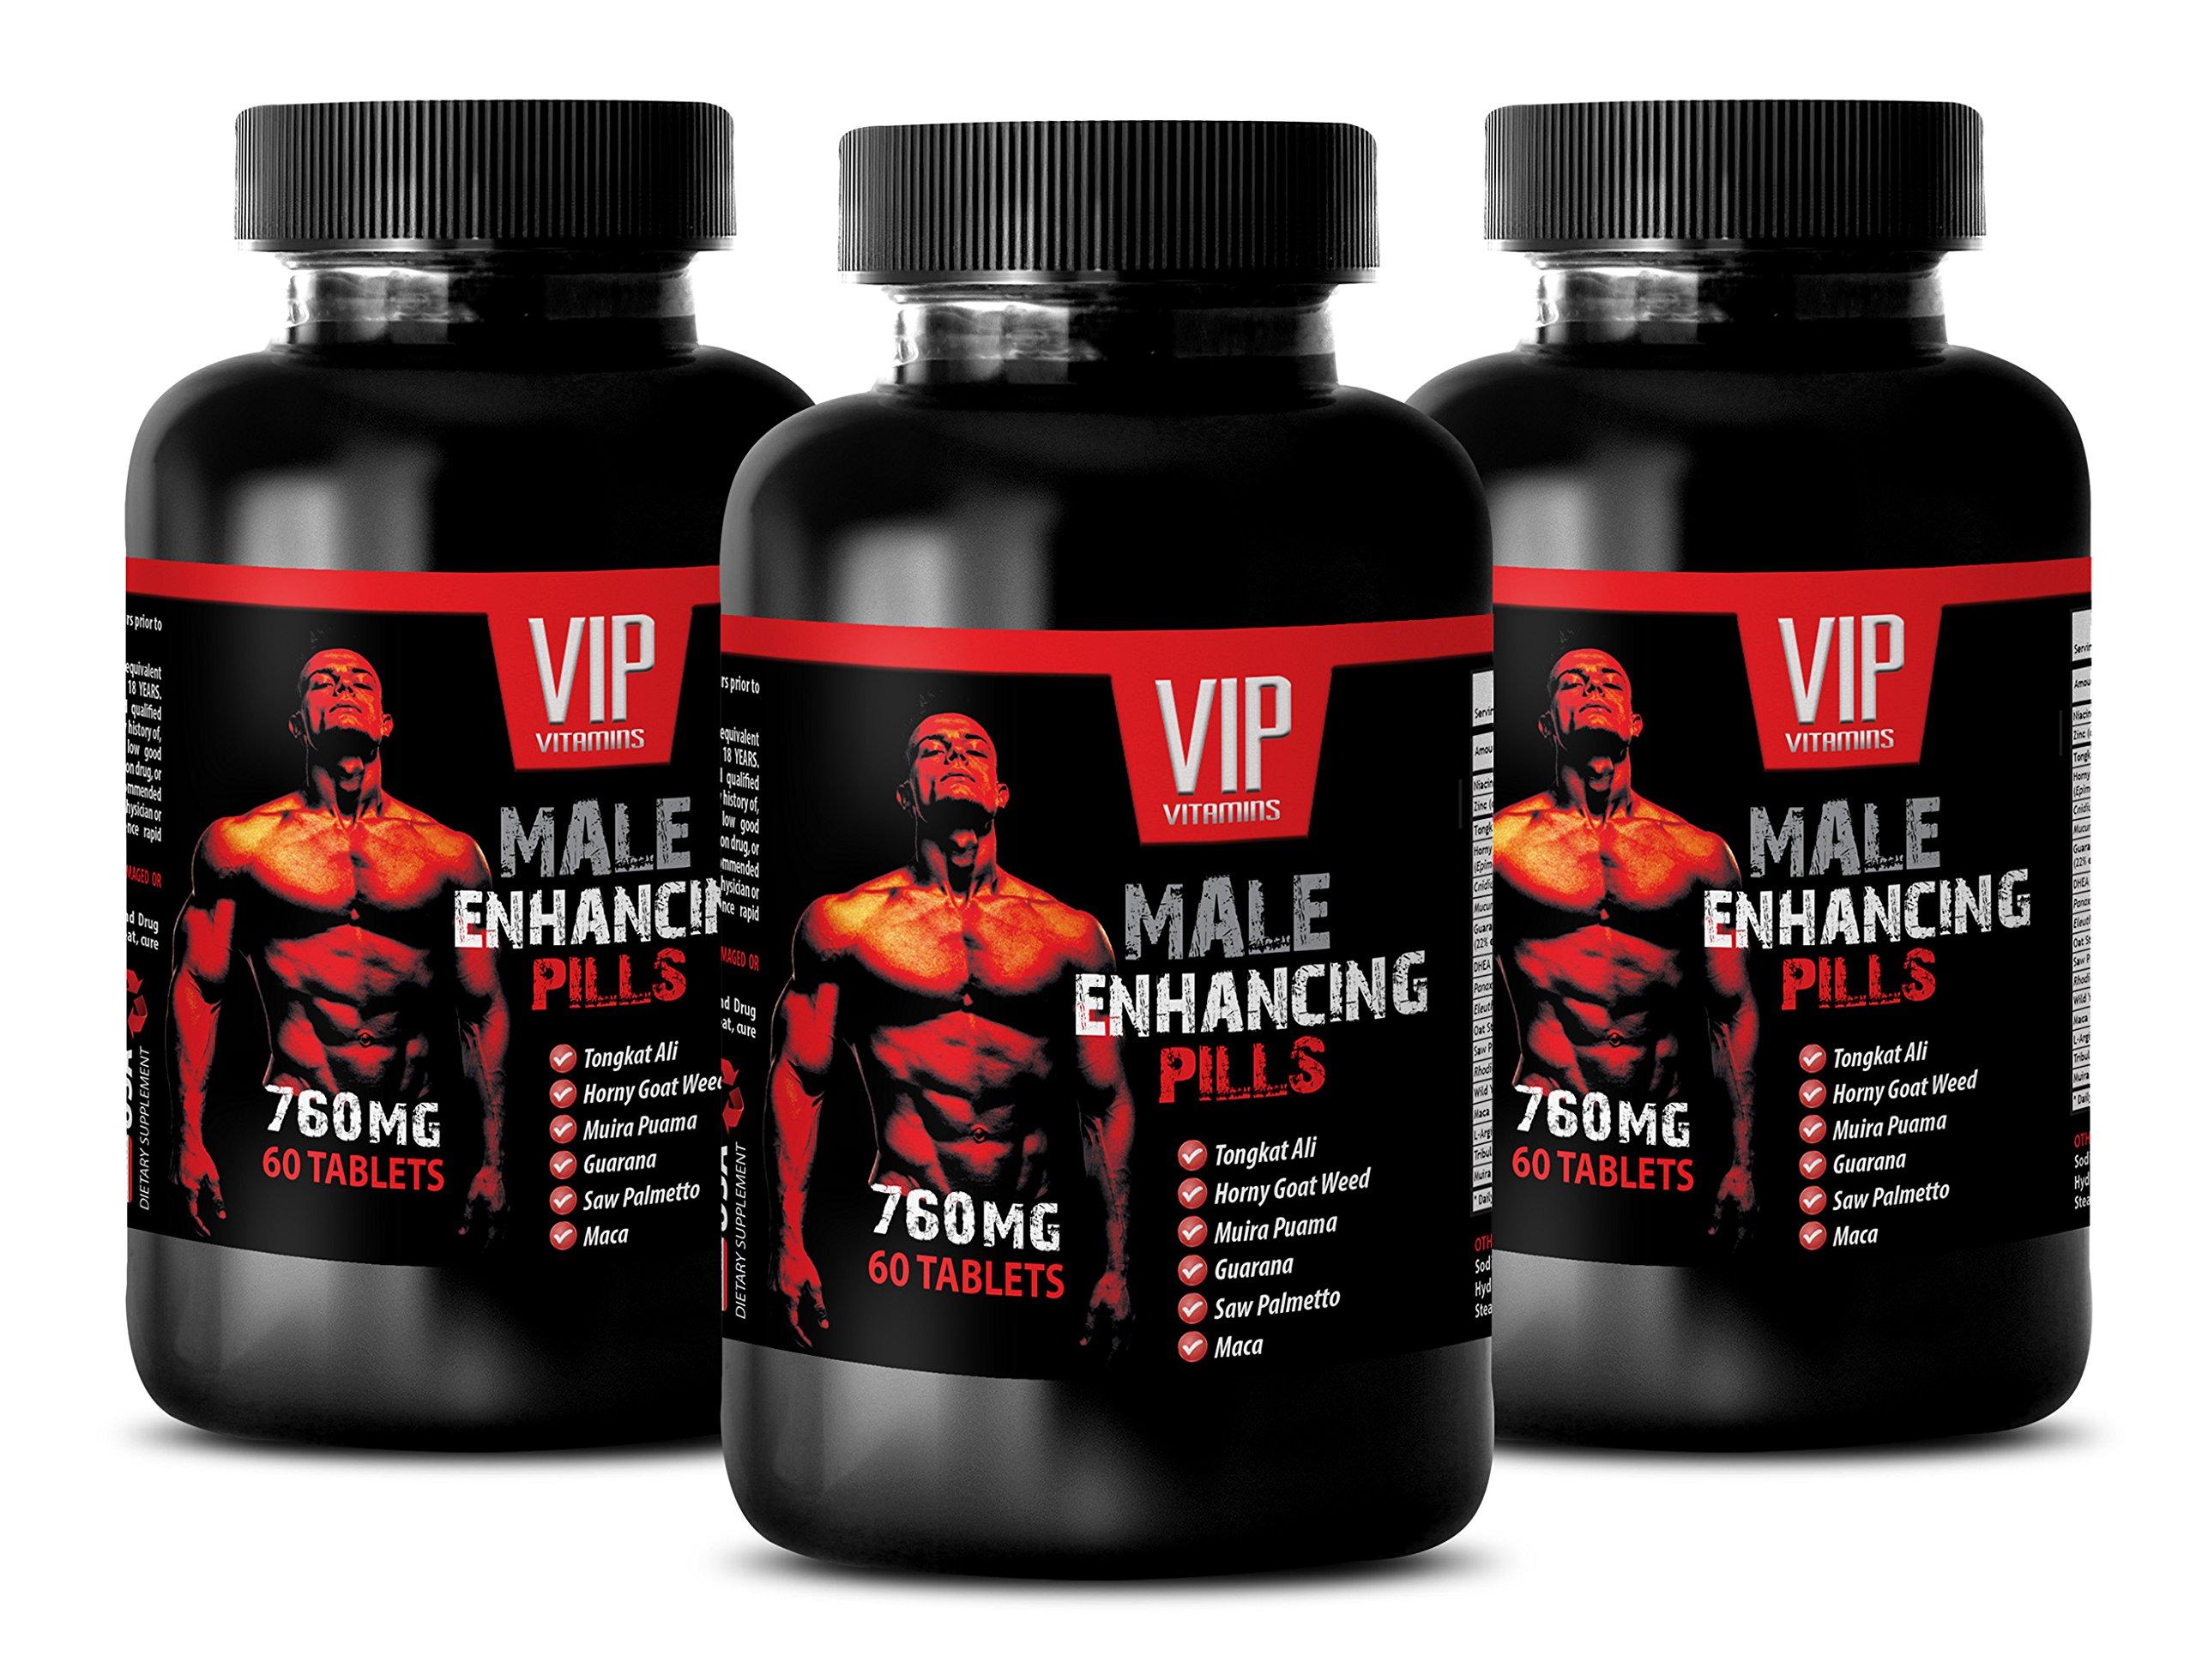 steel libido for men - MALE ENHANCING PILLS 760 Mg - maca for men - 3 Bottles (180 Tablets)